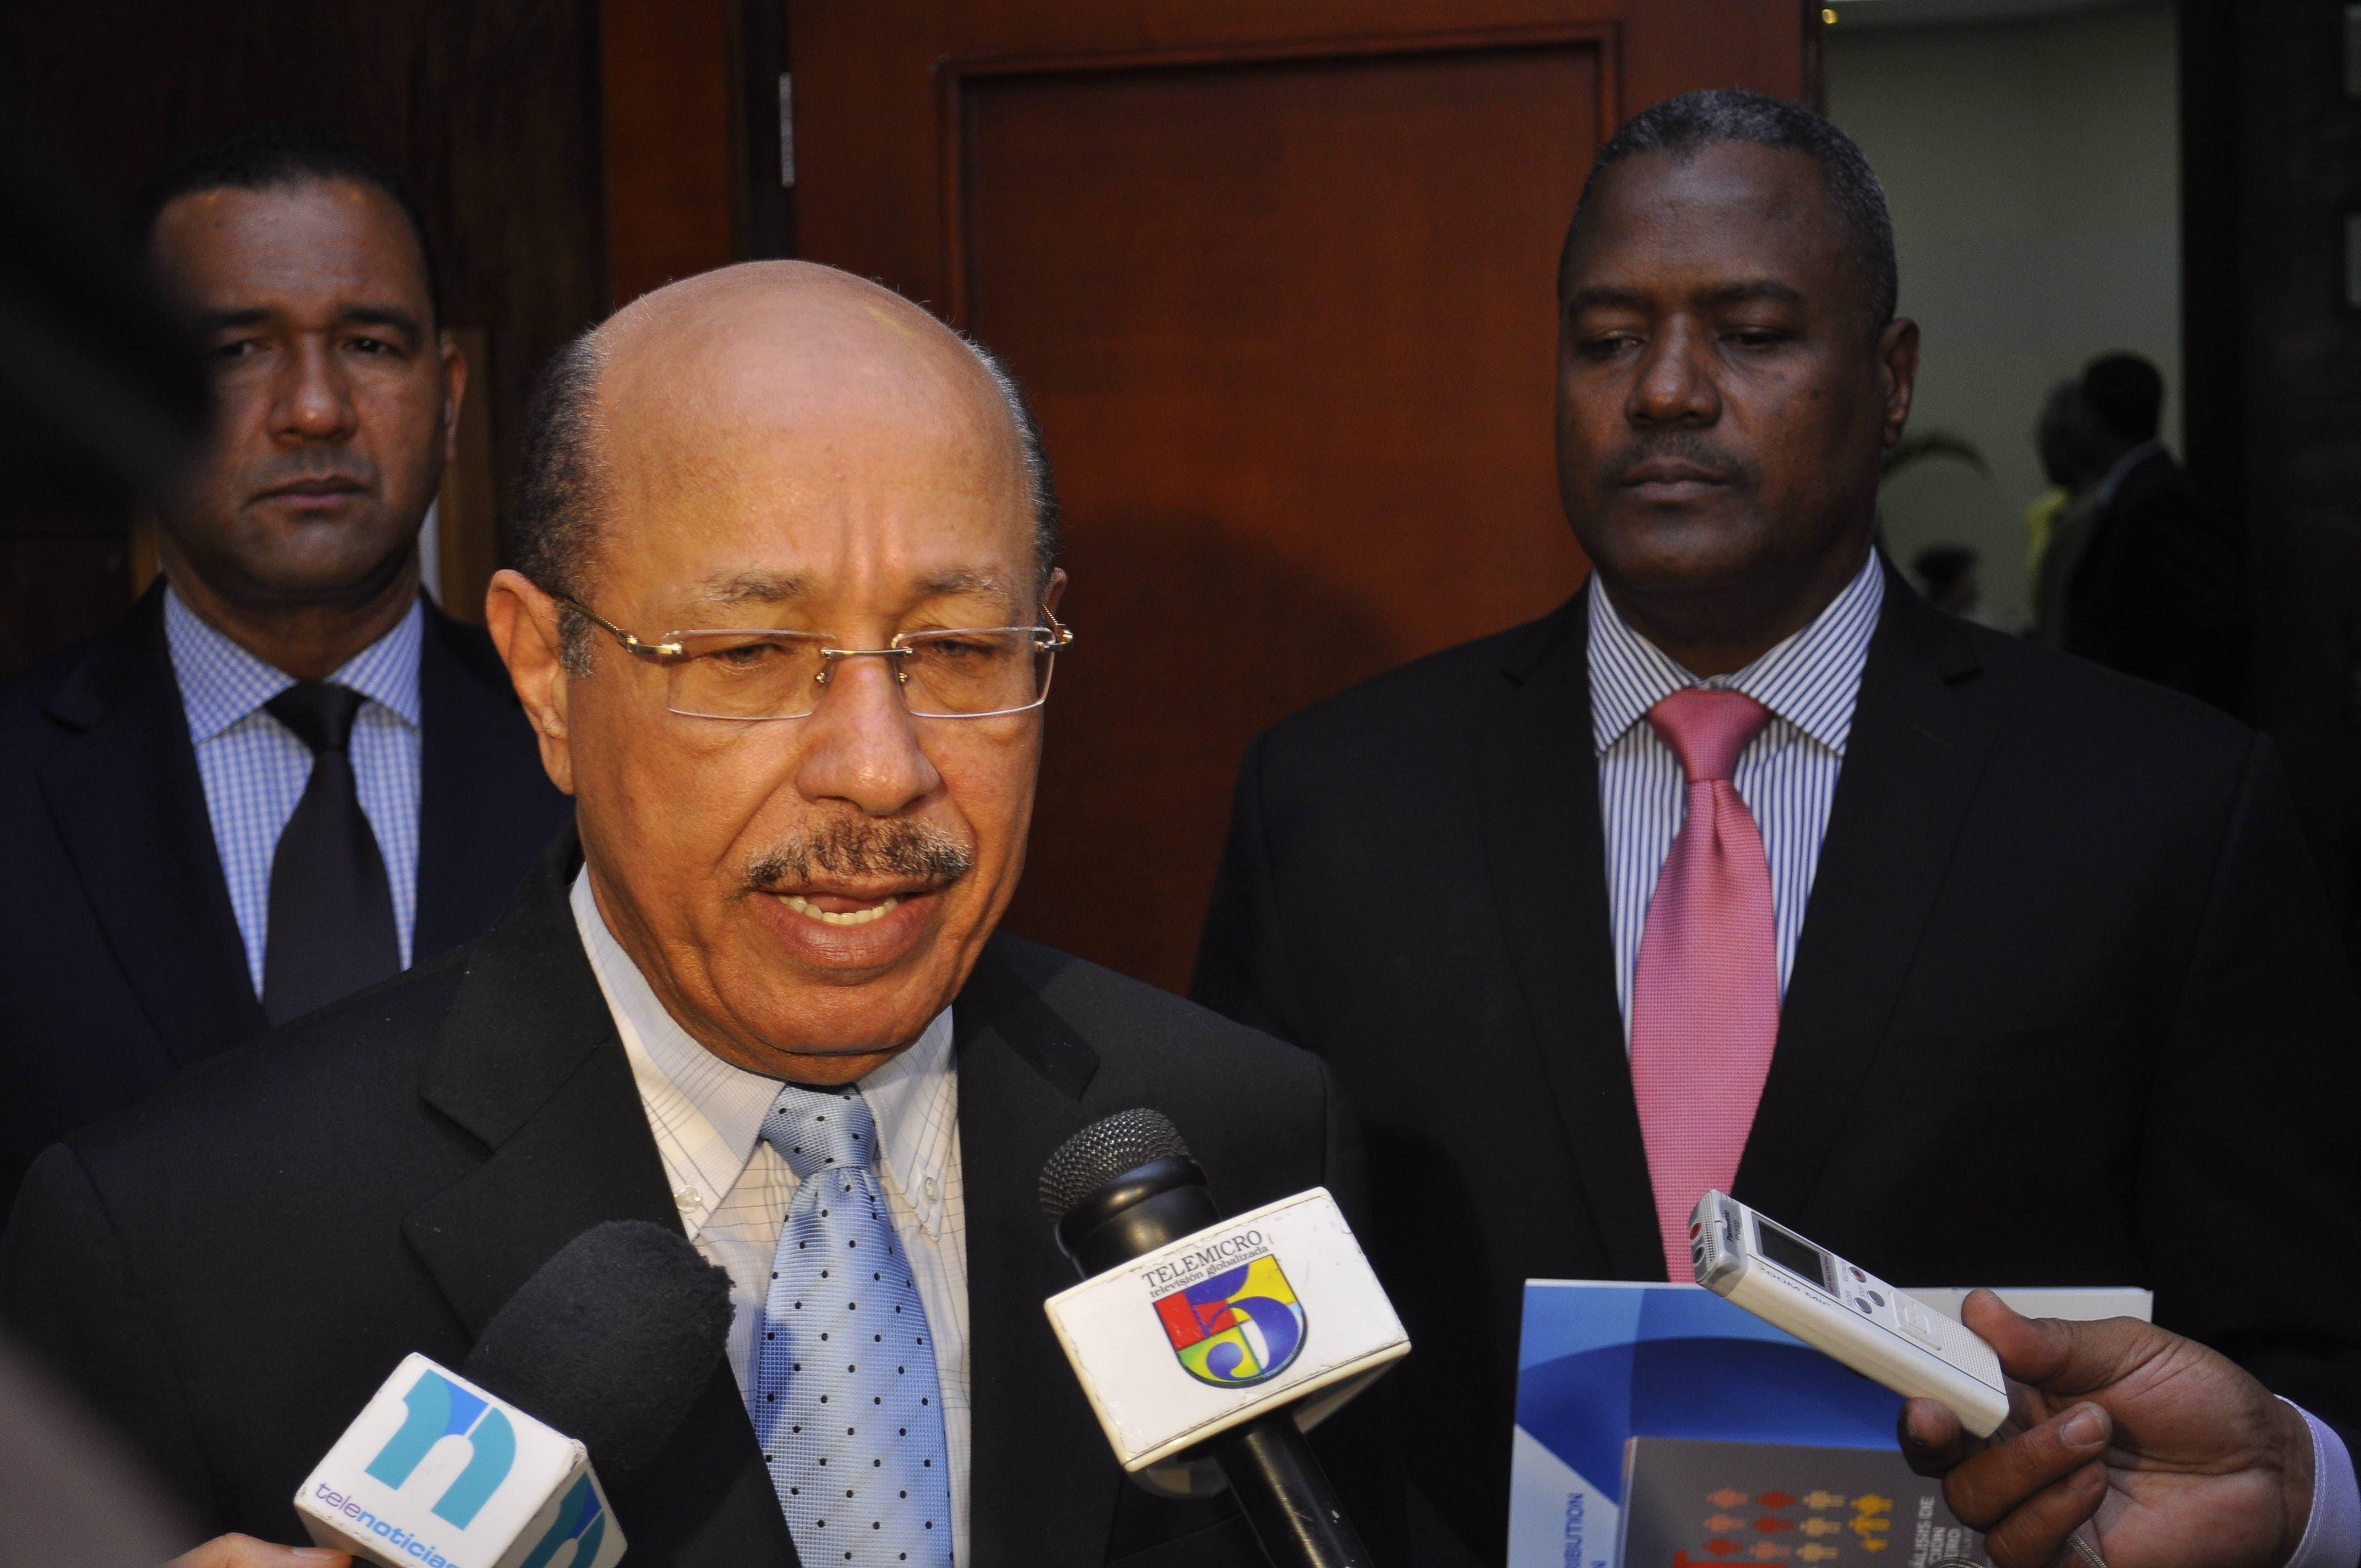 Fenatrado advierte si quitan subsidios a combustibles aumentarán pasaje; marcharán hoy